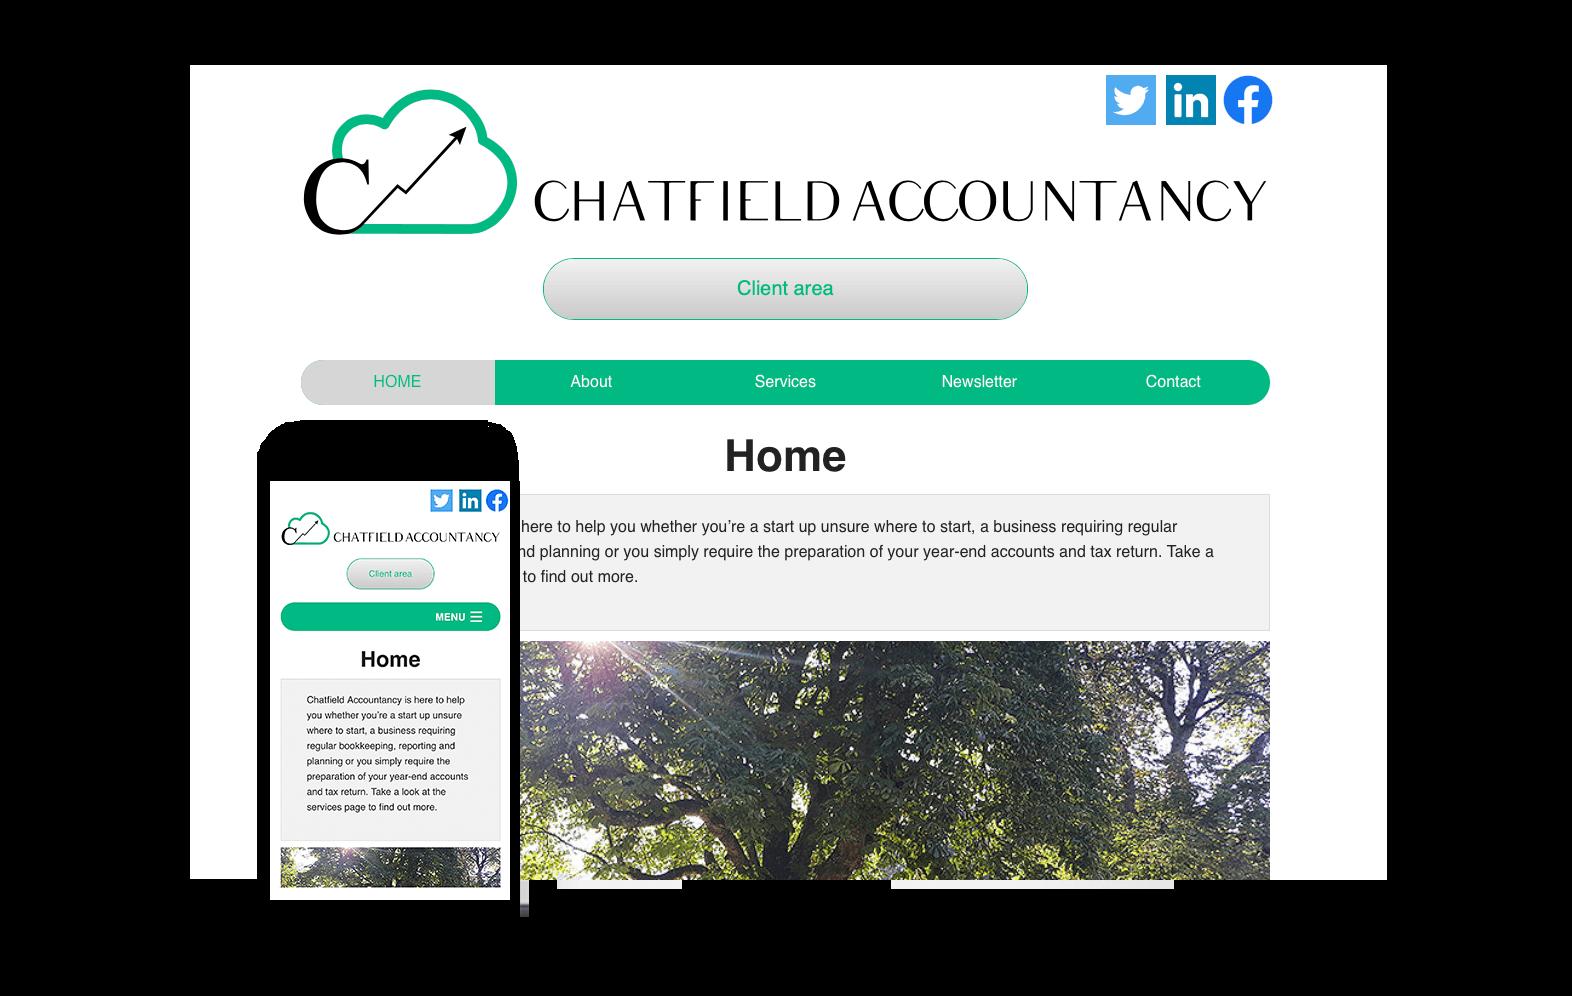 Chatfield Accountancy website image